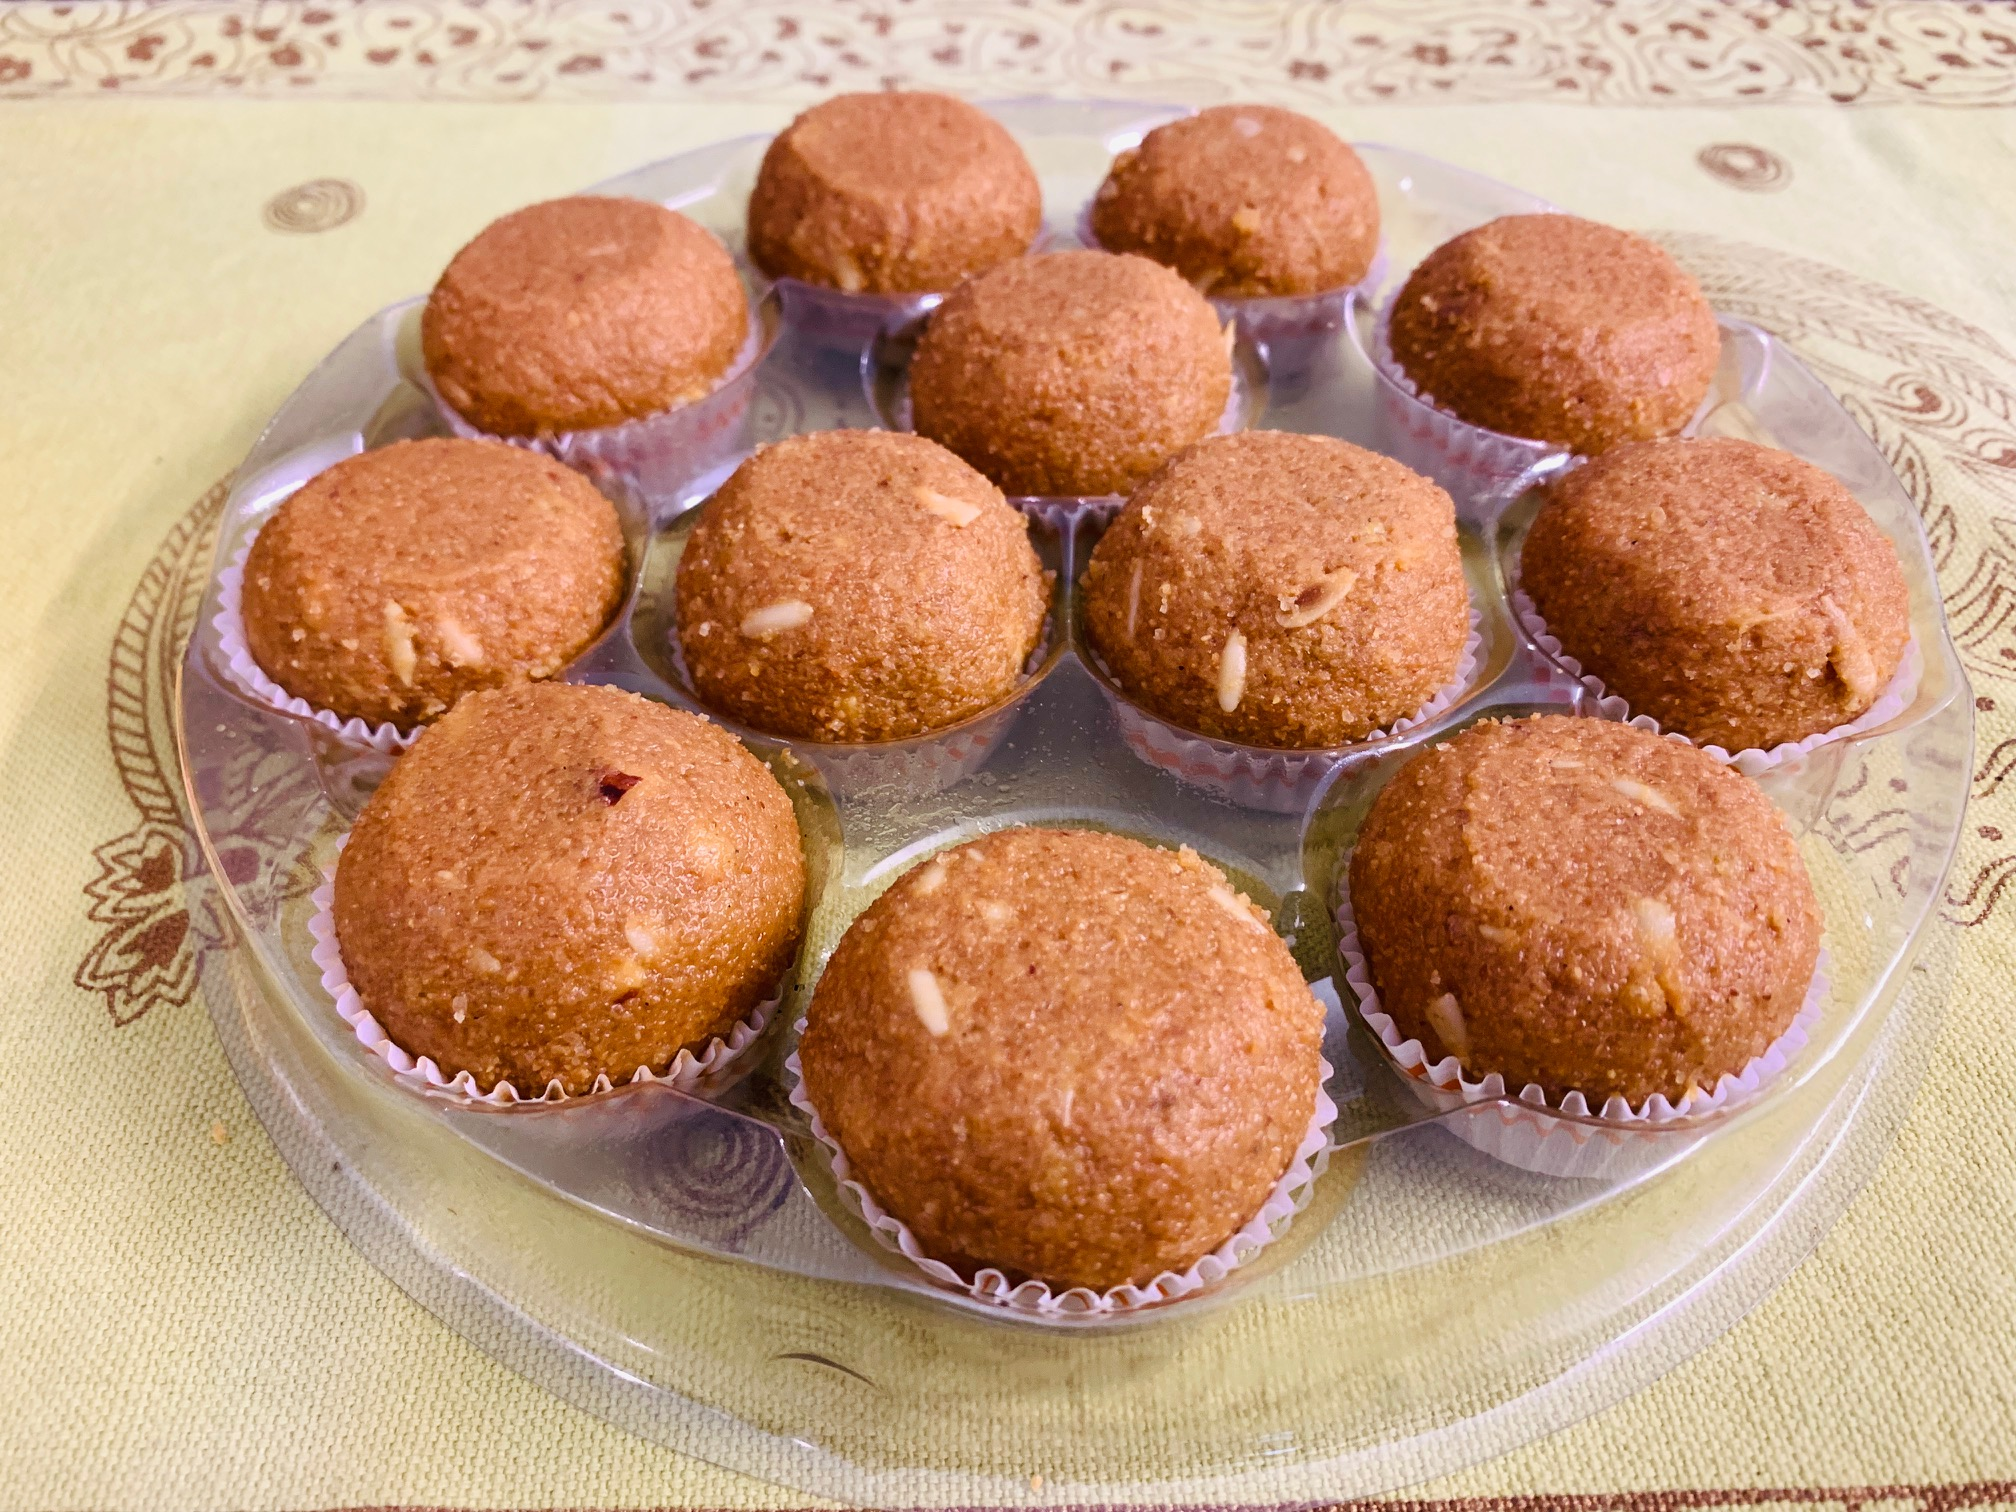 Mishry Mums Review: Haldiram's Dry Fruit Besan Ladoo